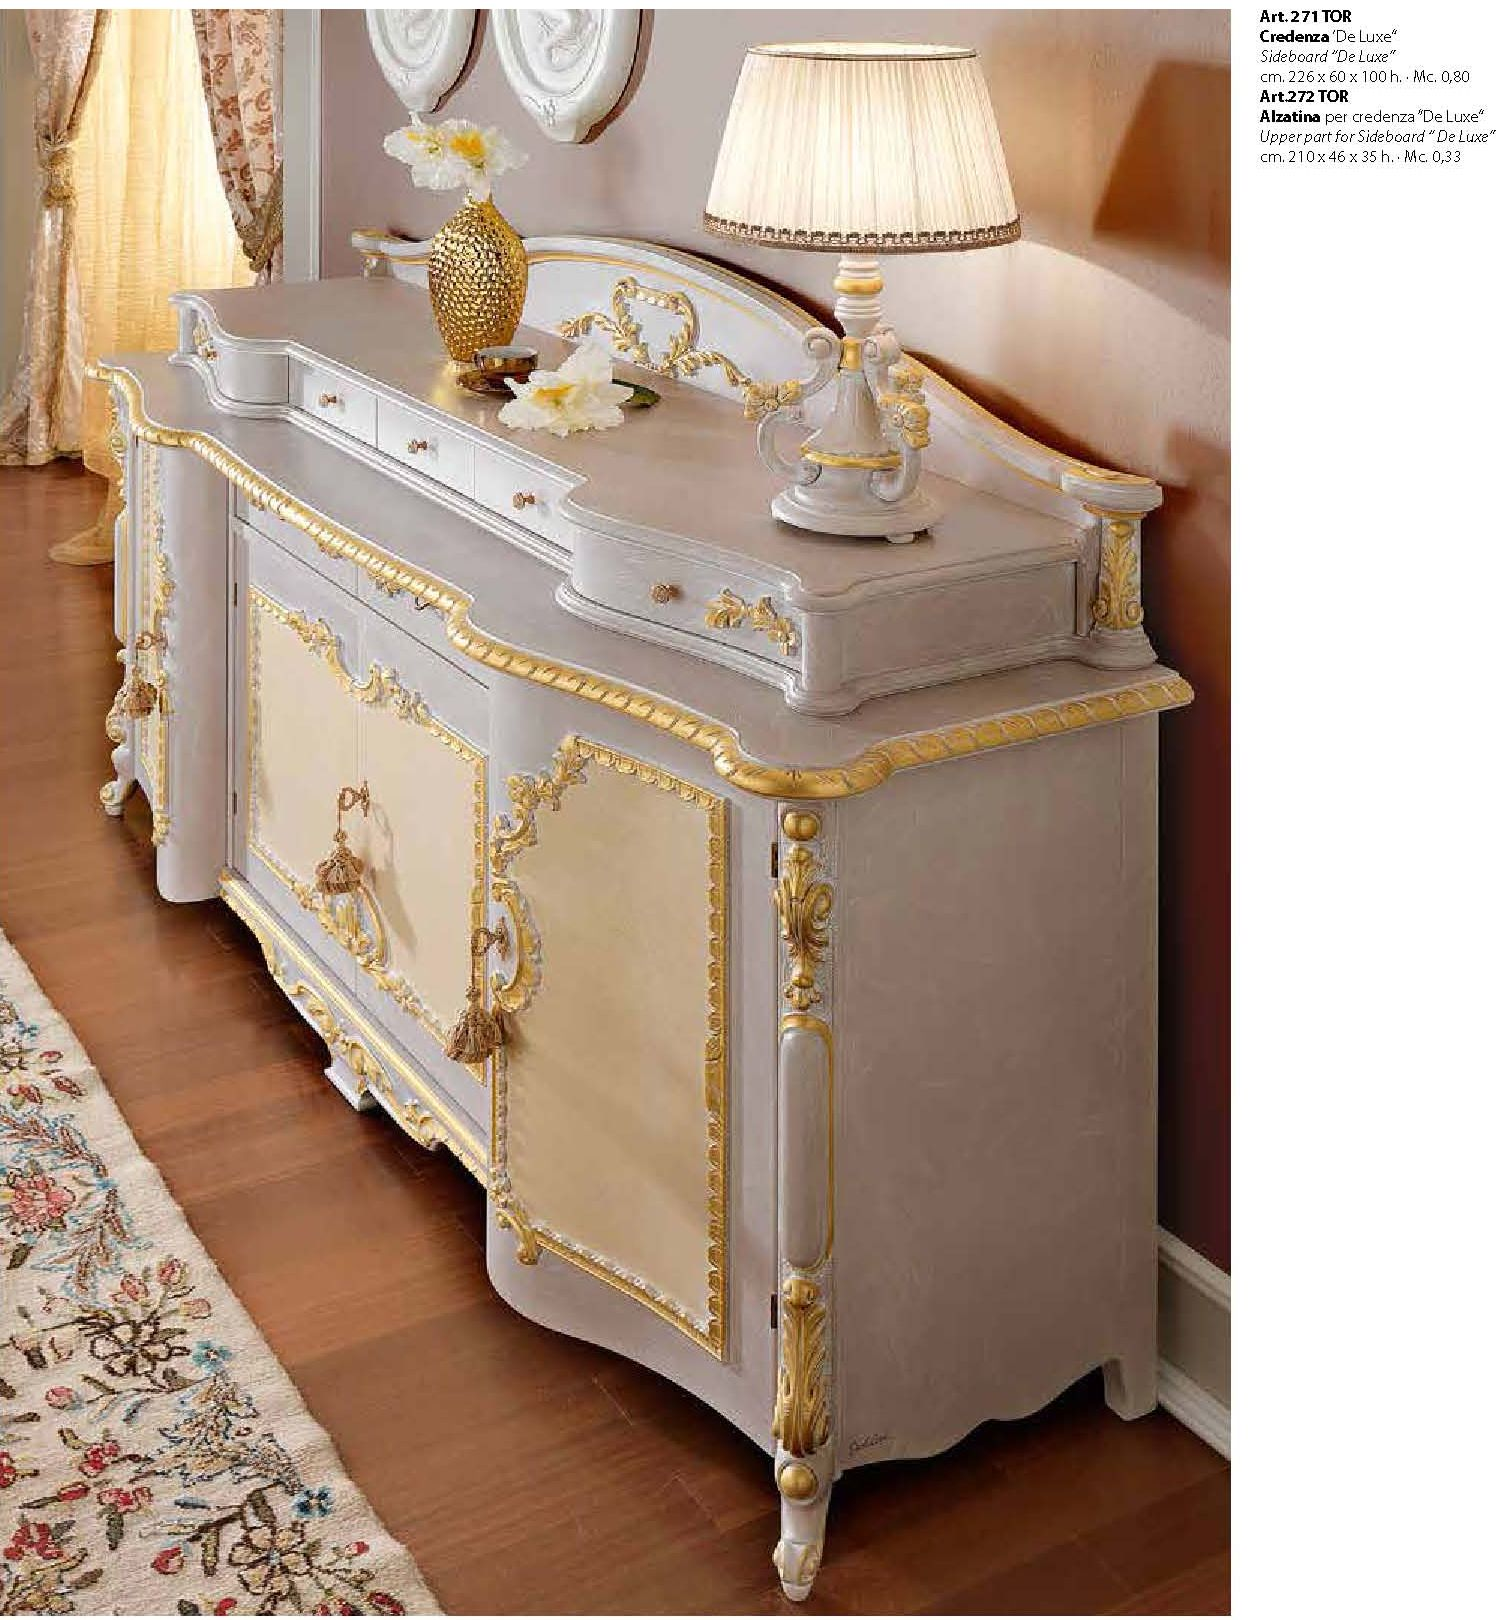 Muebles de lujo - Armario BARROCO PISTOLESI serie de lujo DE ...